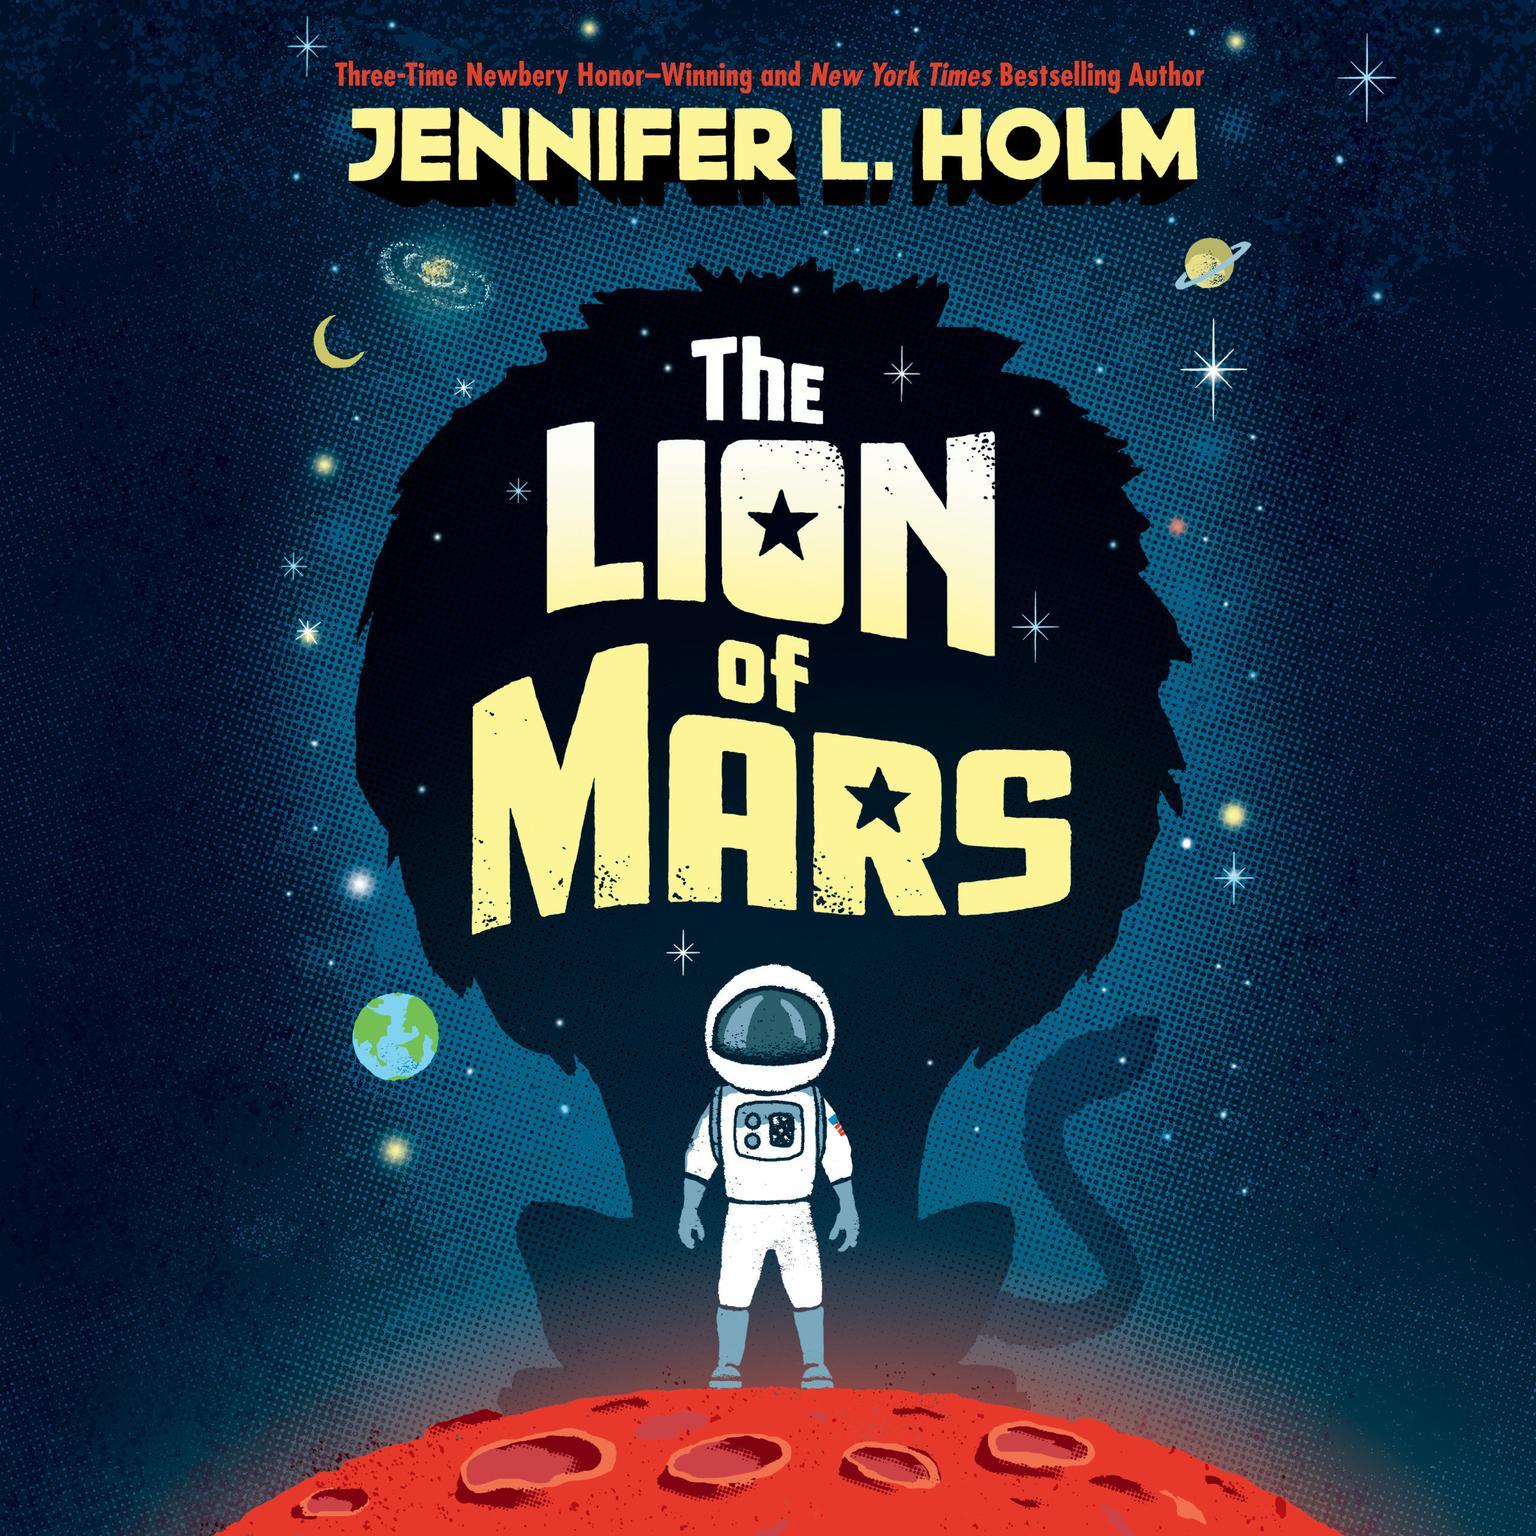 The Lion of Mars Audiobook, by Jennifer L. Holm